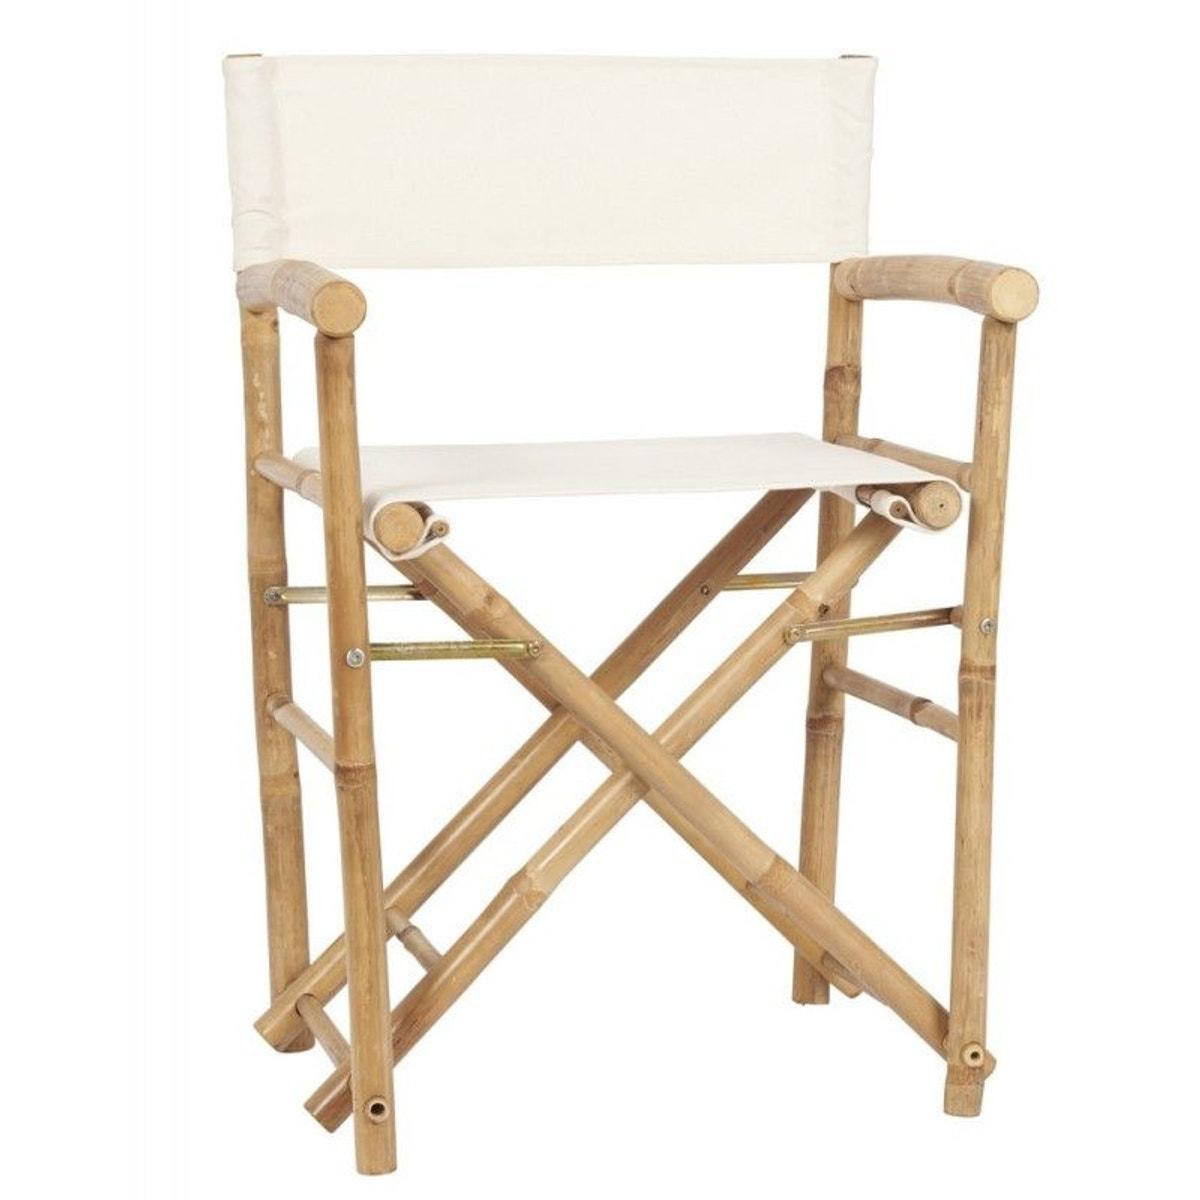 Chaise Pliante Avec Accoudoirs Bois Bambou Naturel Toile Taille Taille Unique Chaise Pliante Bois Chaise Pliante Chaise